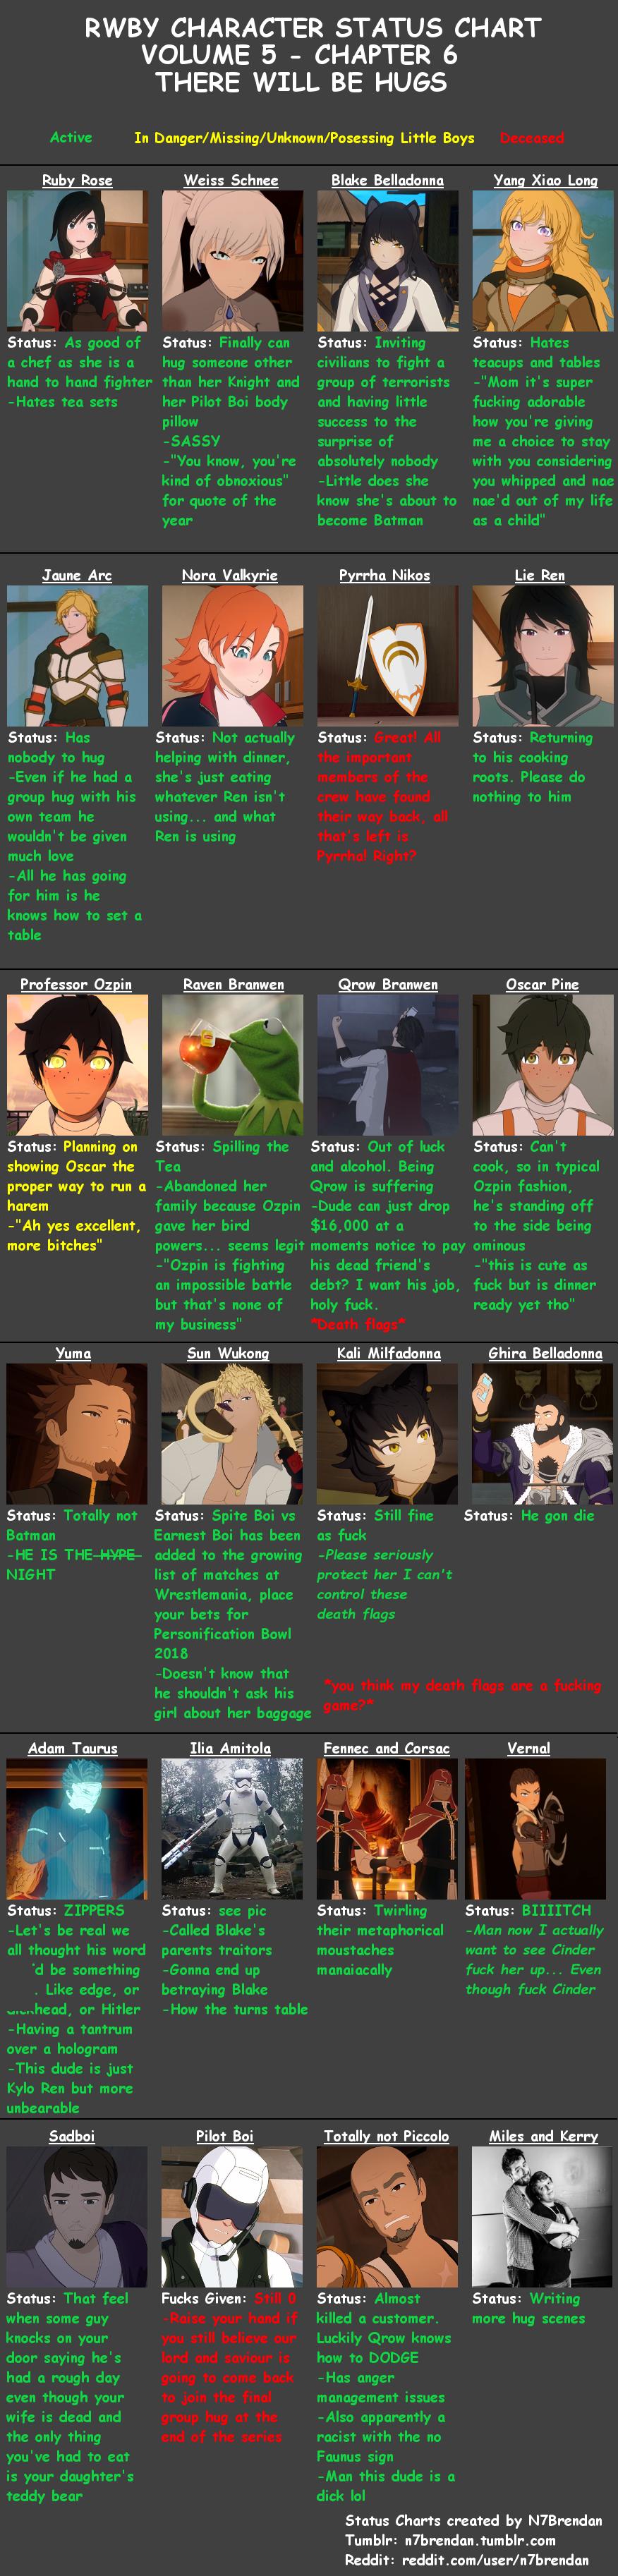 RWBY Character Status Chart Volume 5 Episode 6 | Rwby Miscellaneous